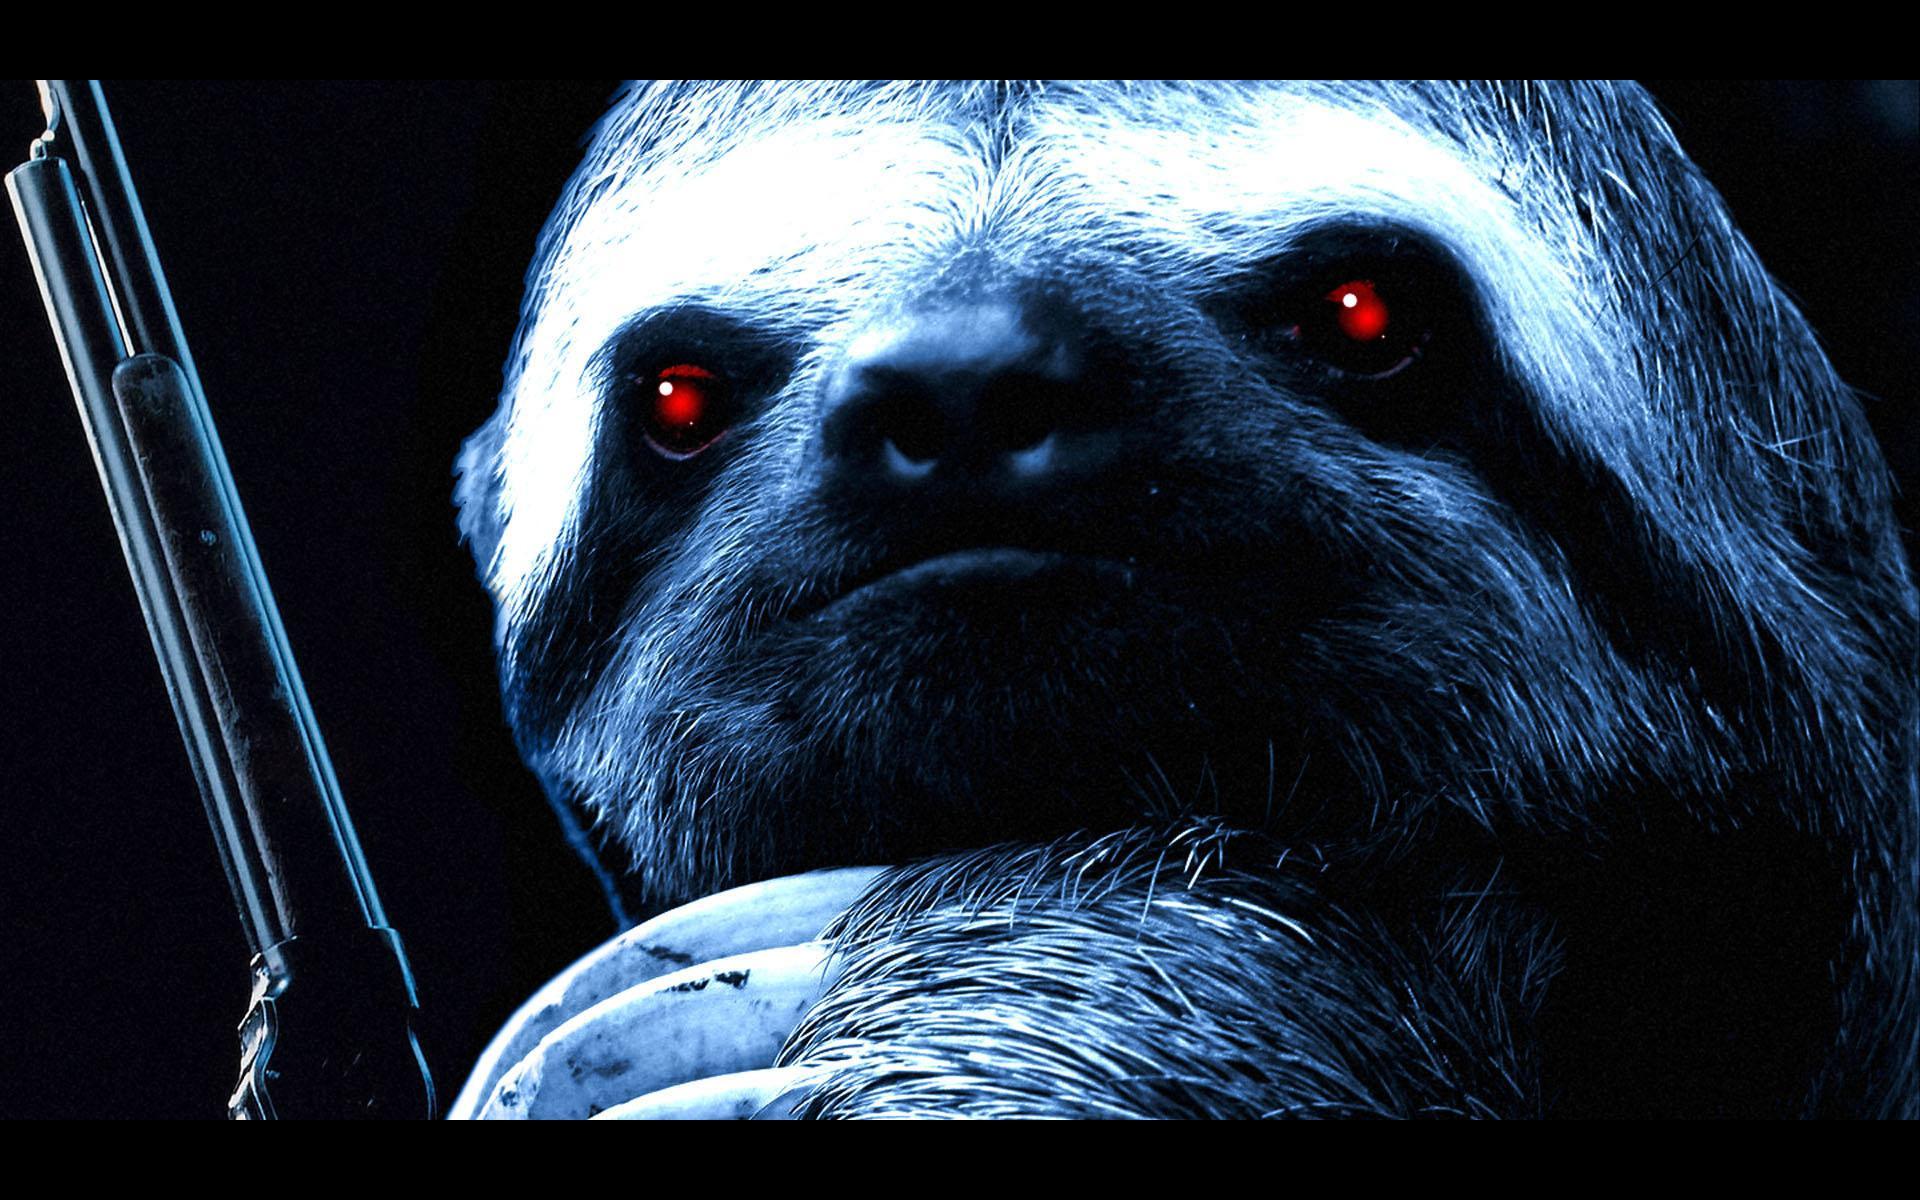 Sloth Wallpaper HD Download